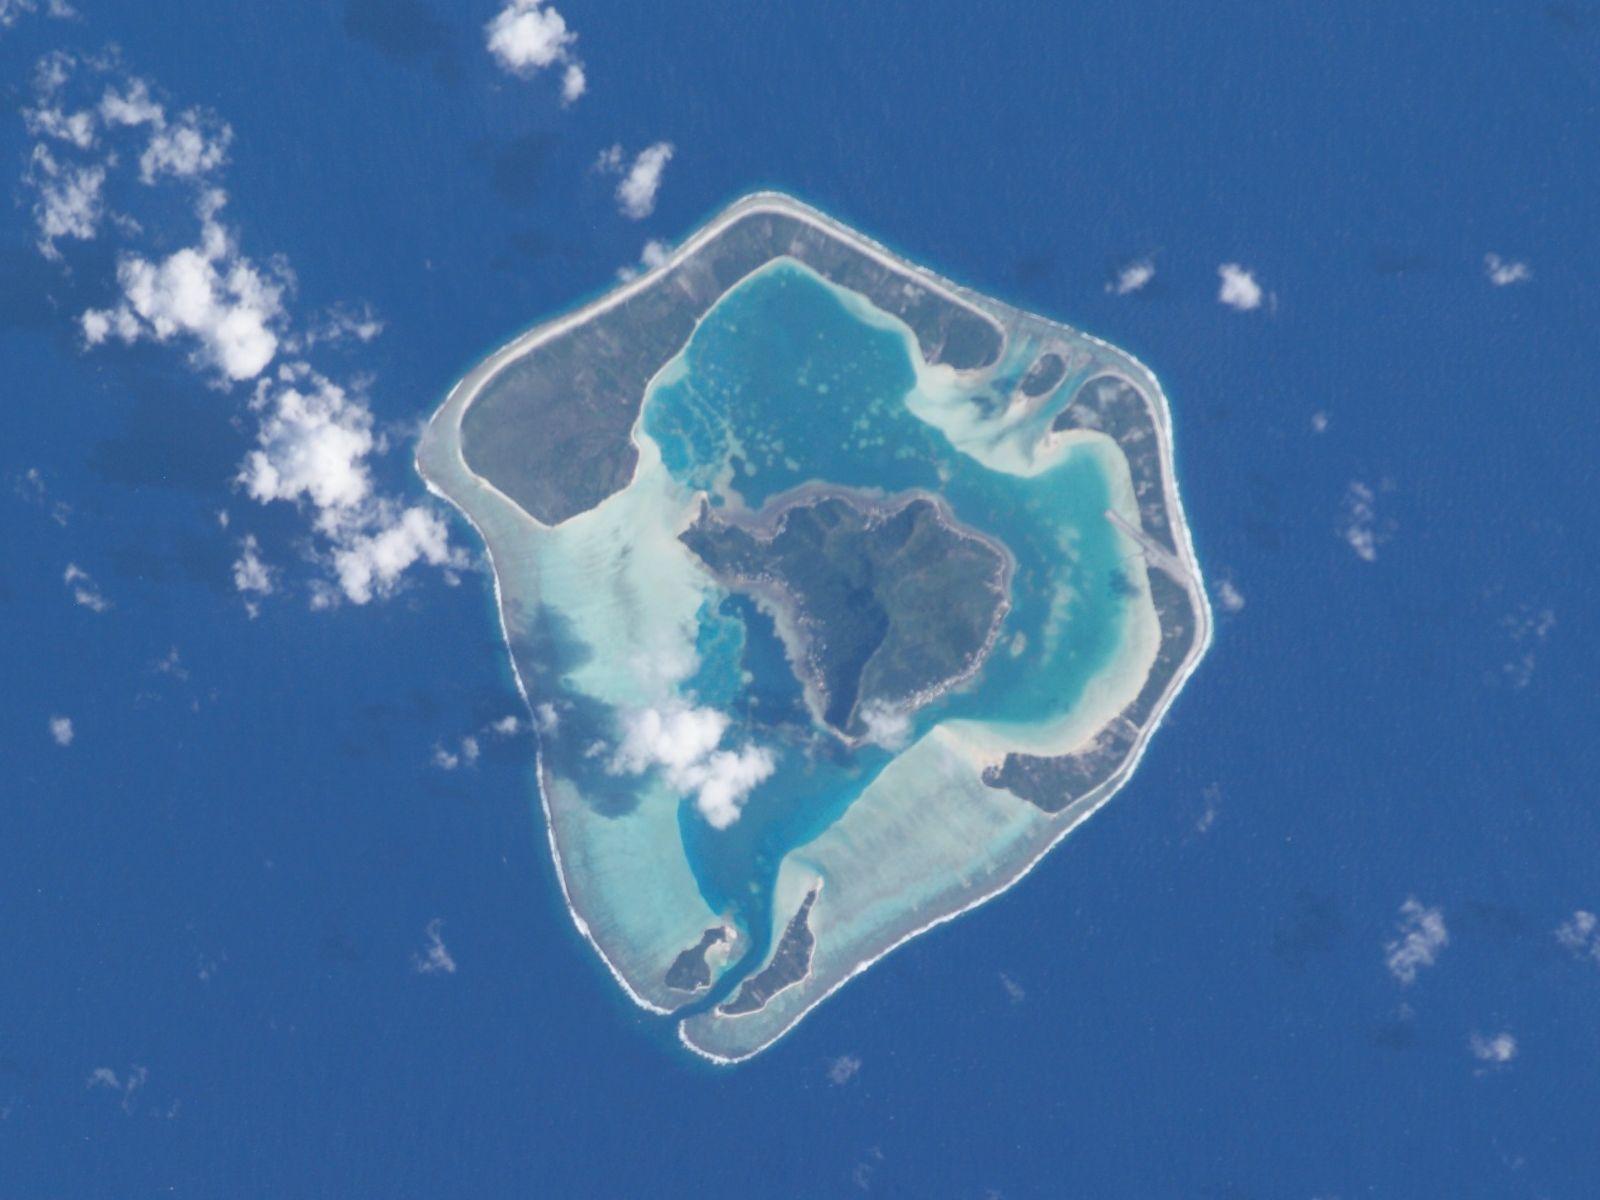 Illa Maupiti